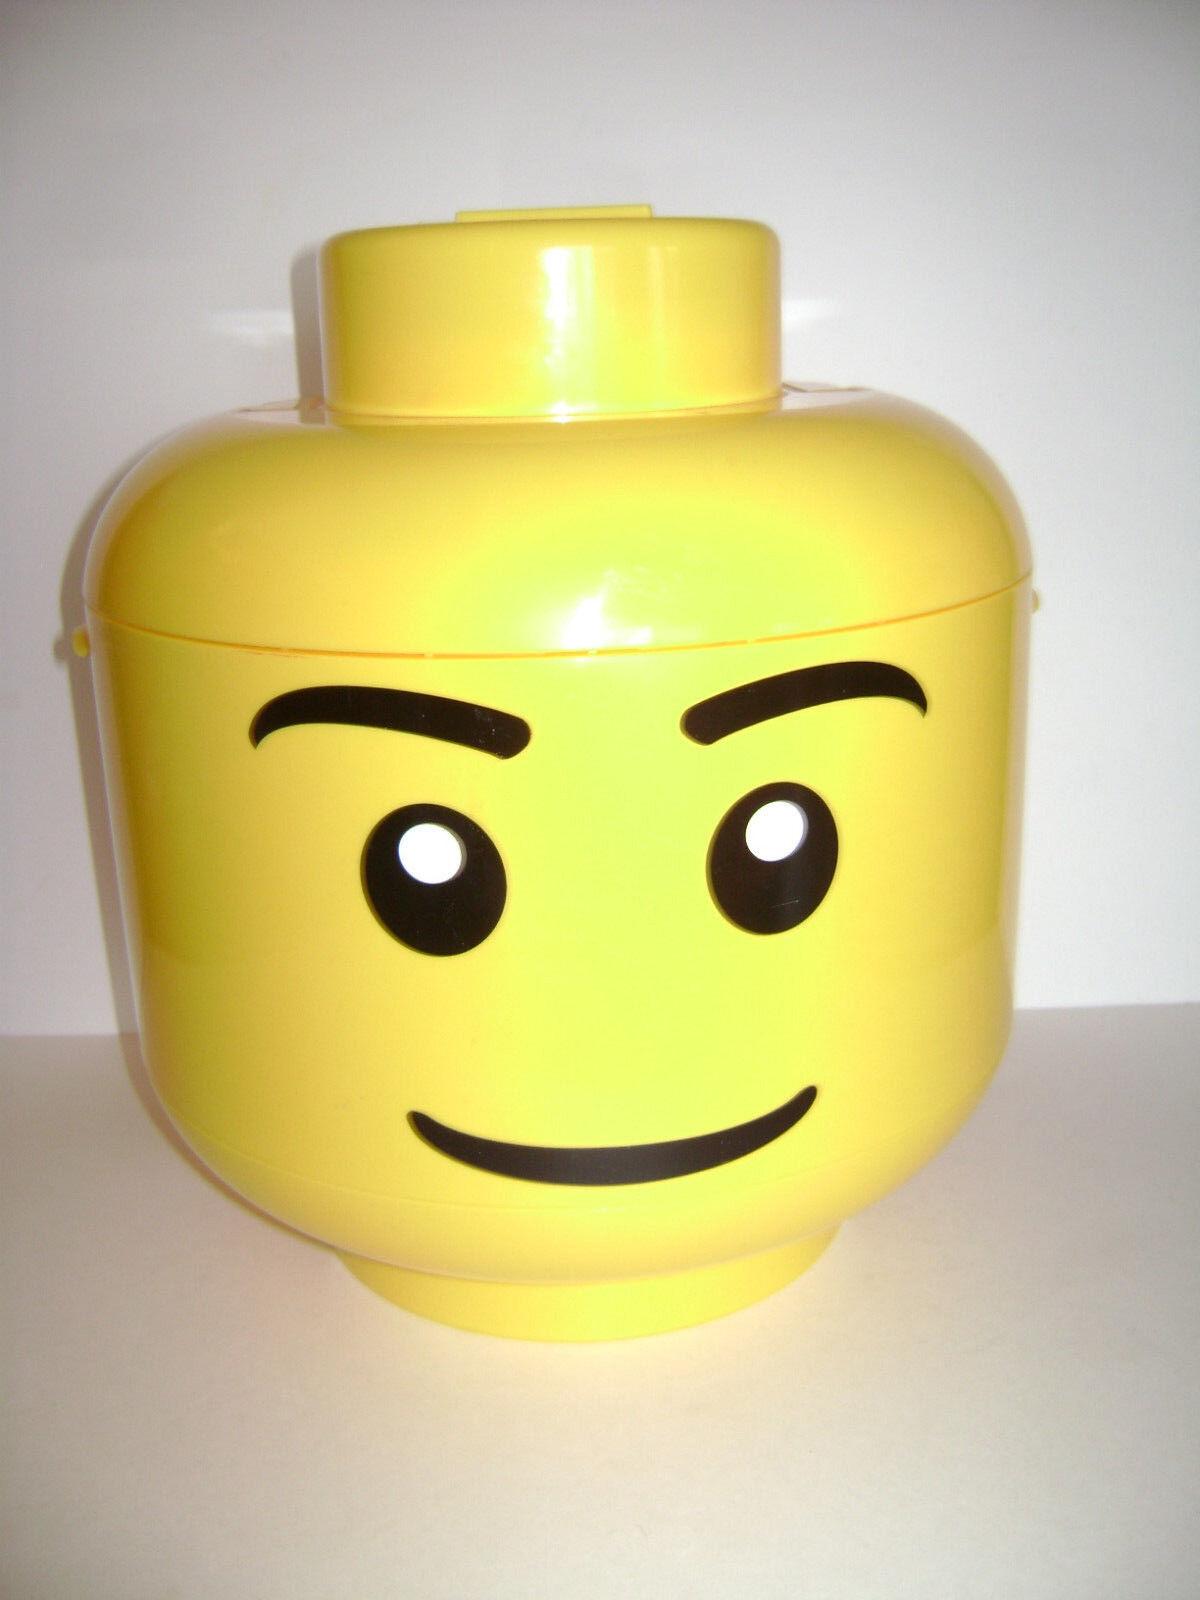 LEGO 2010 Sort & Store Big Gelb Storage Head Bin with Grids RETIrot VERY RARE